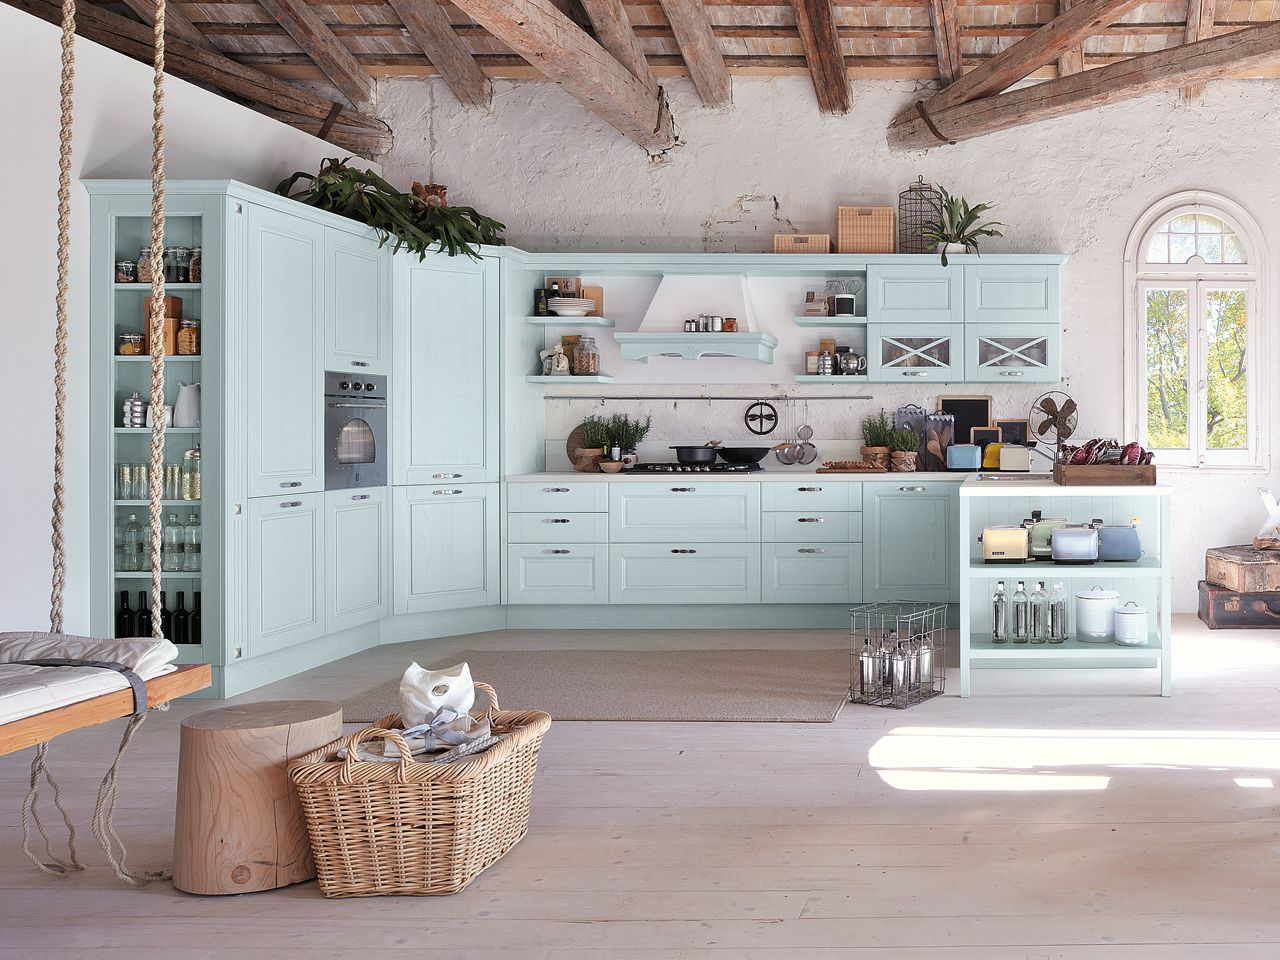 AGNESE - Cucina Lube Classica   AGNESE / Cucine Lube Classiche ...